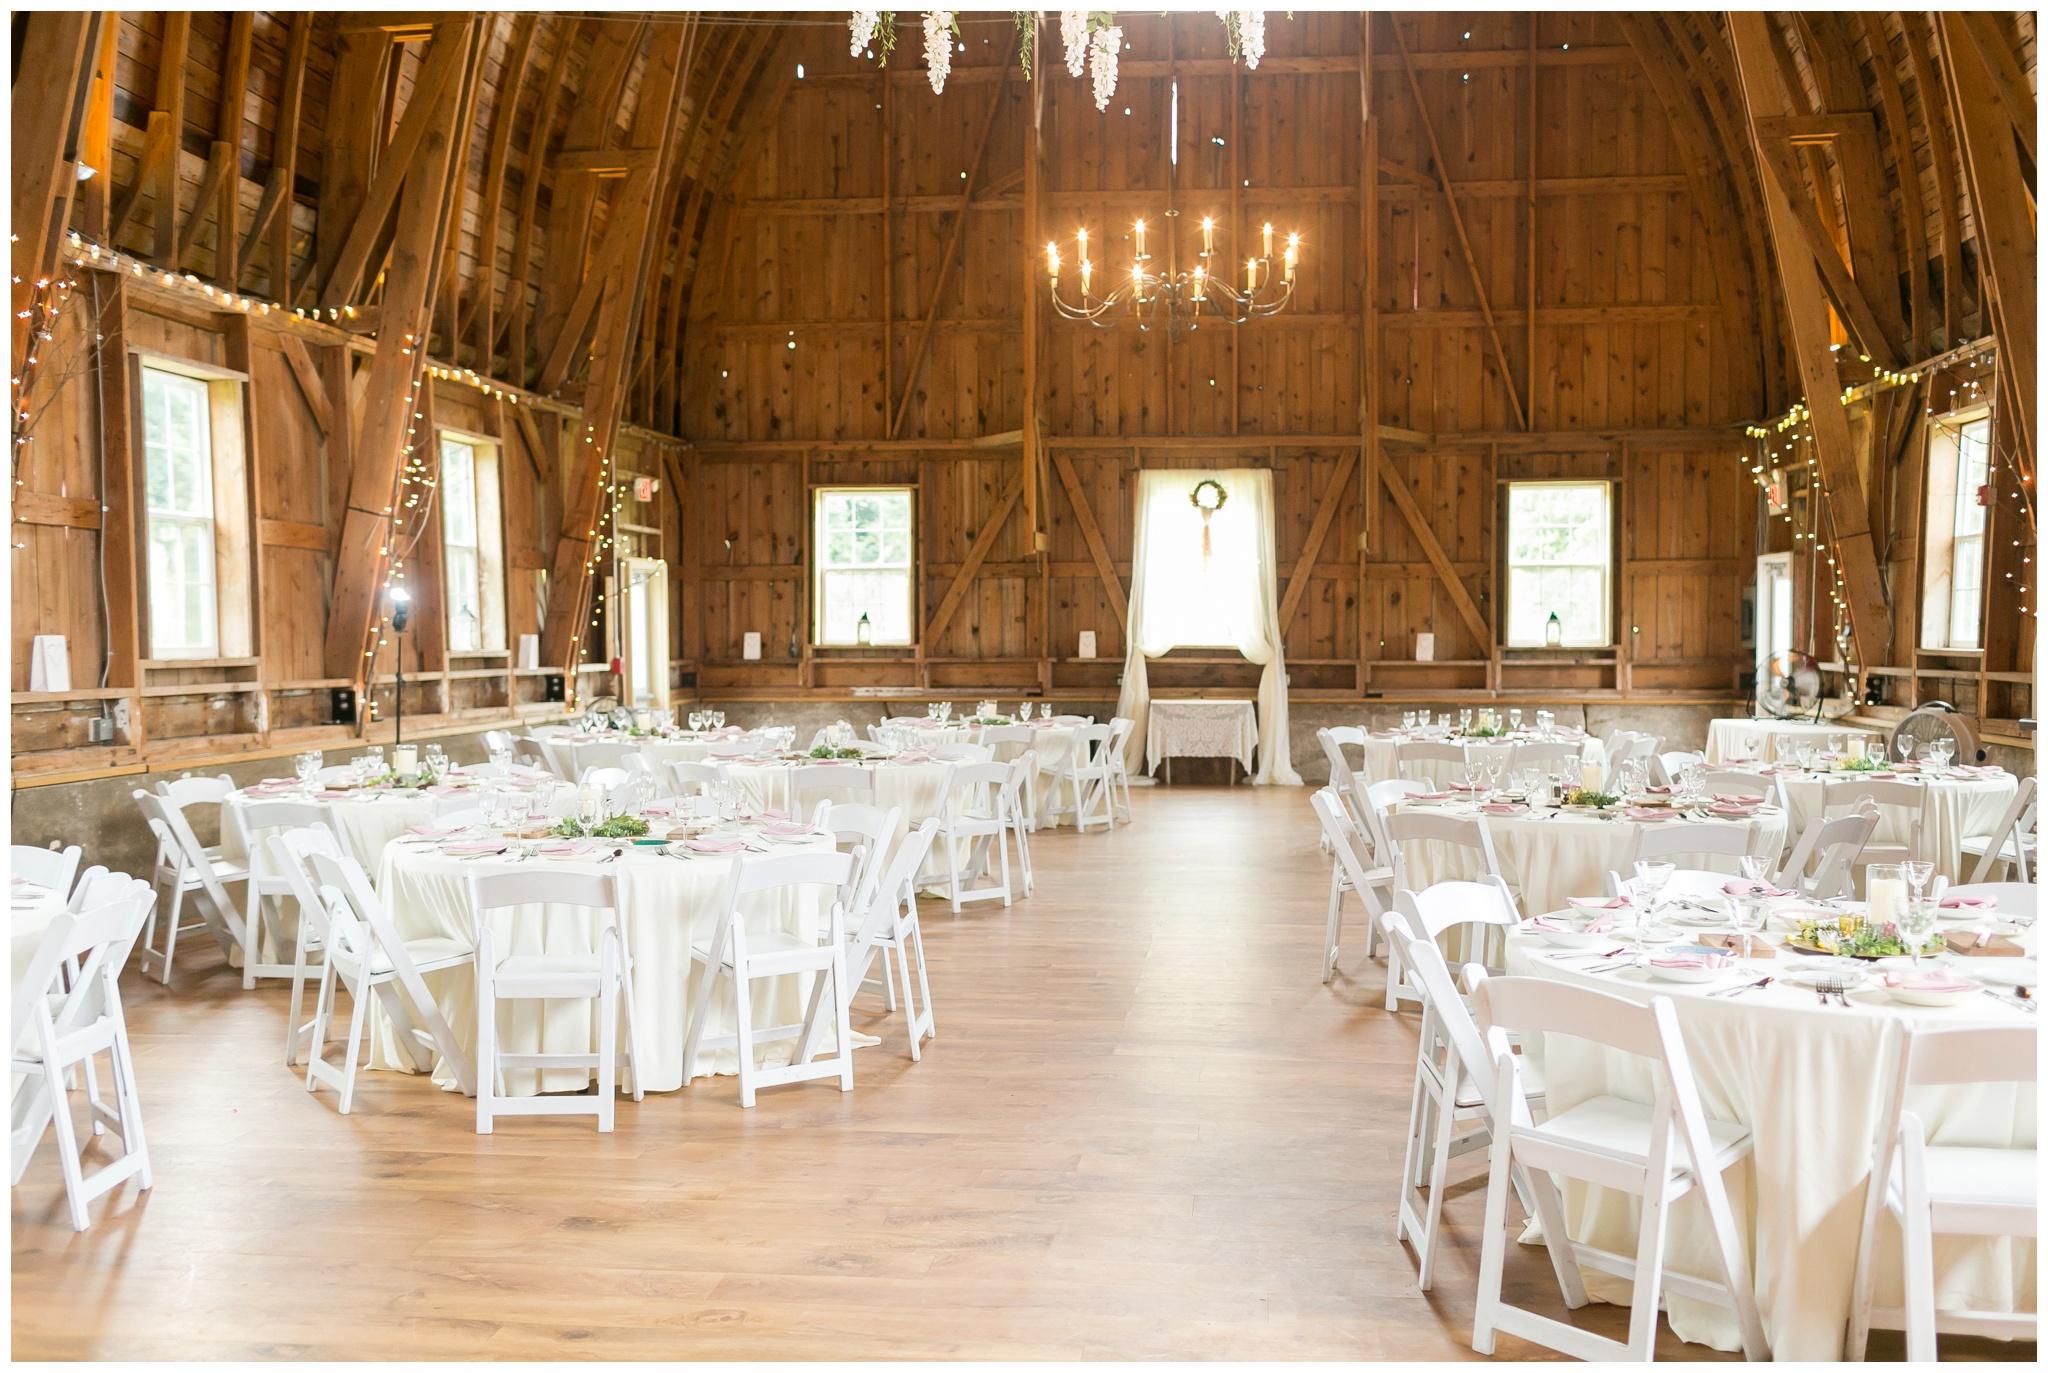 Sugarland_barn_arena_wisconsin_wedding_madison_wisconsin_4282.jpg